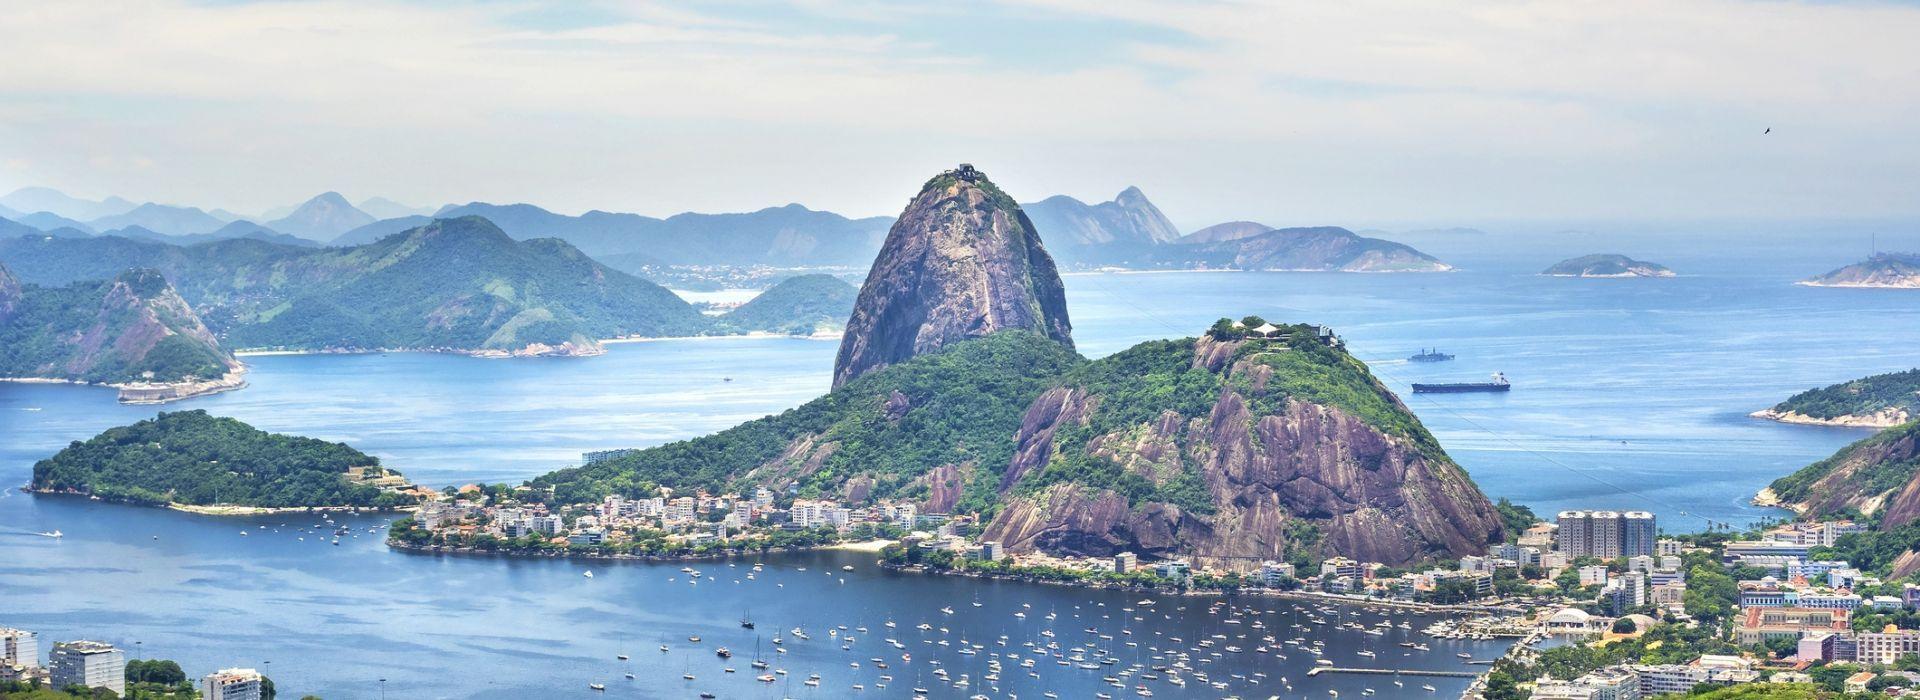 Trekking Tours in Rio de Janeiro